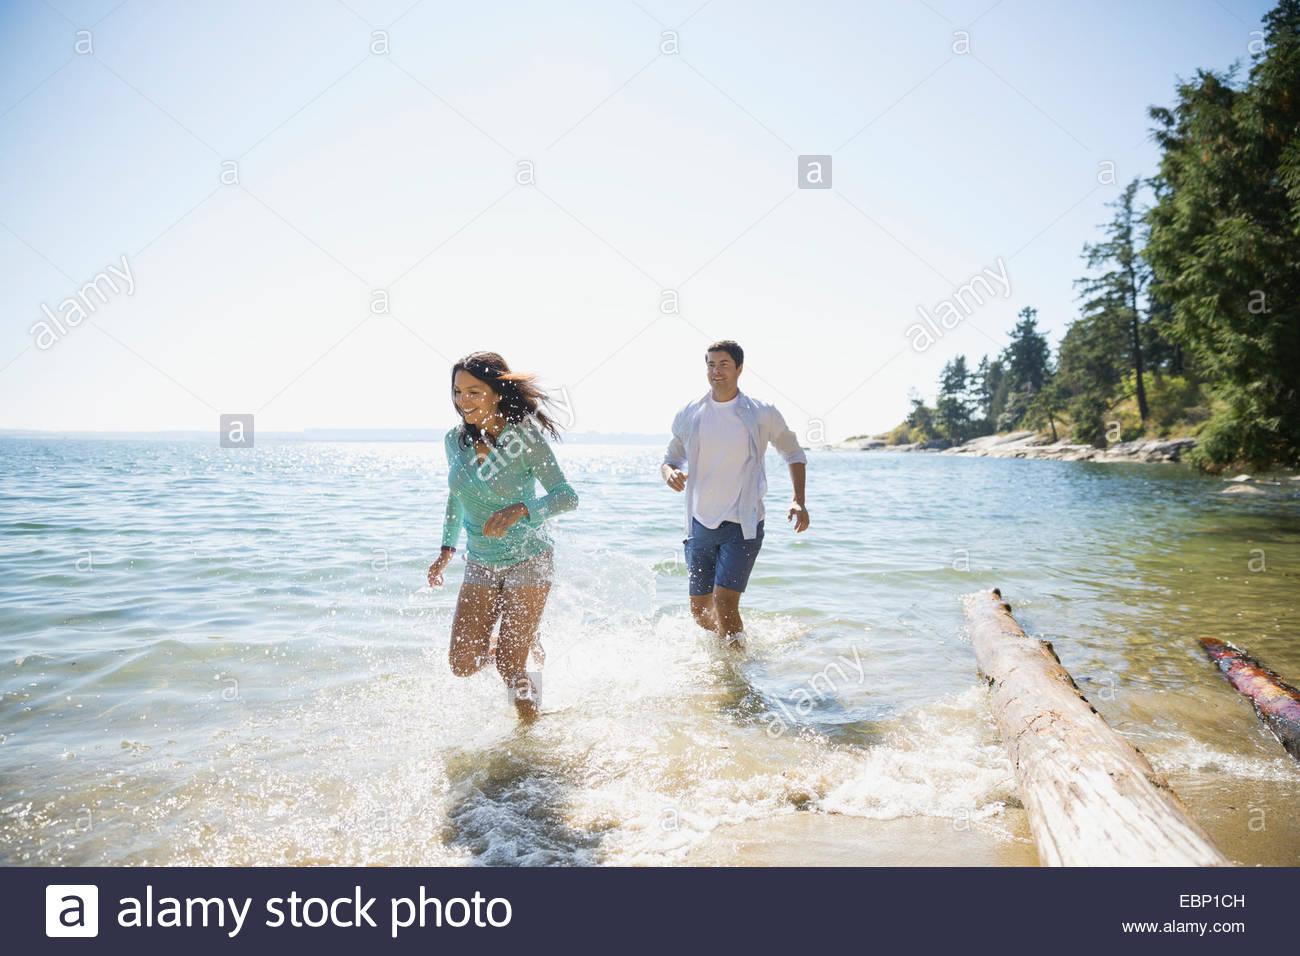 Couple splashing in ocean - Stock Image